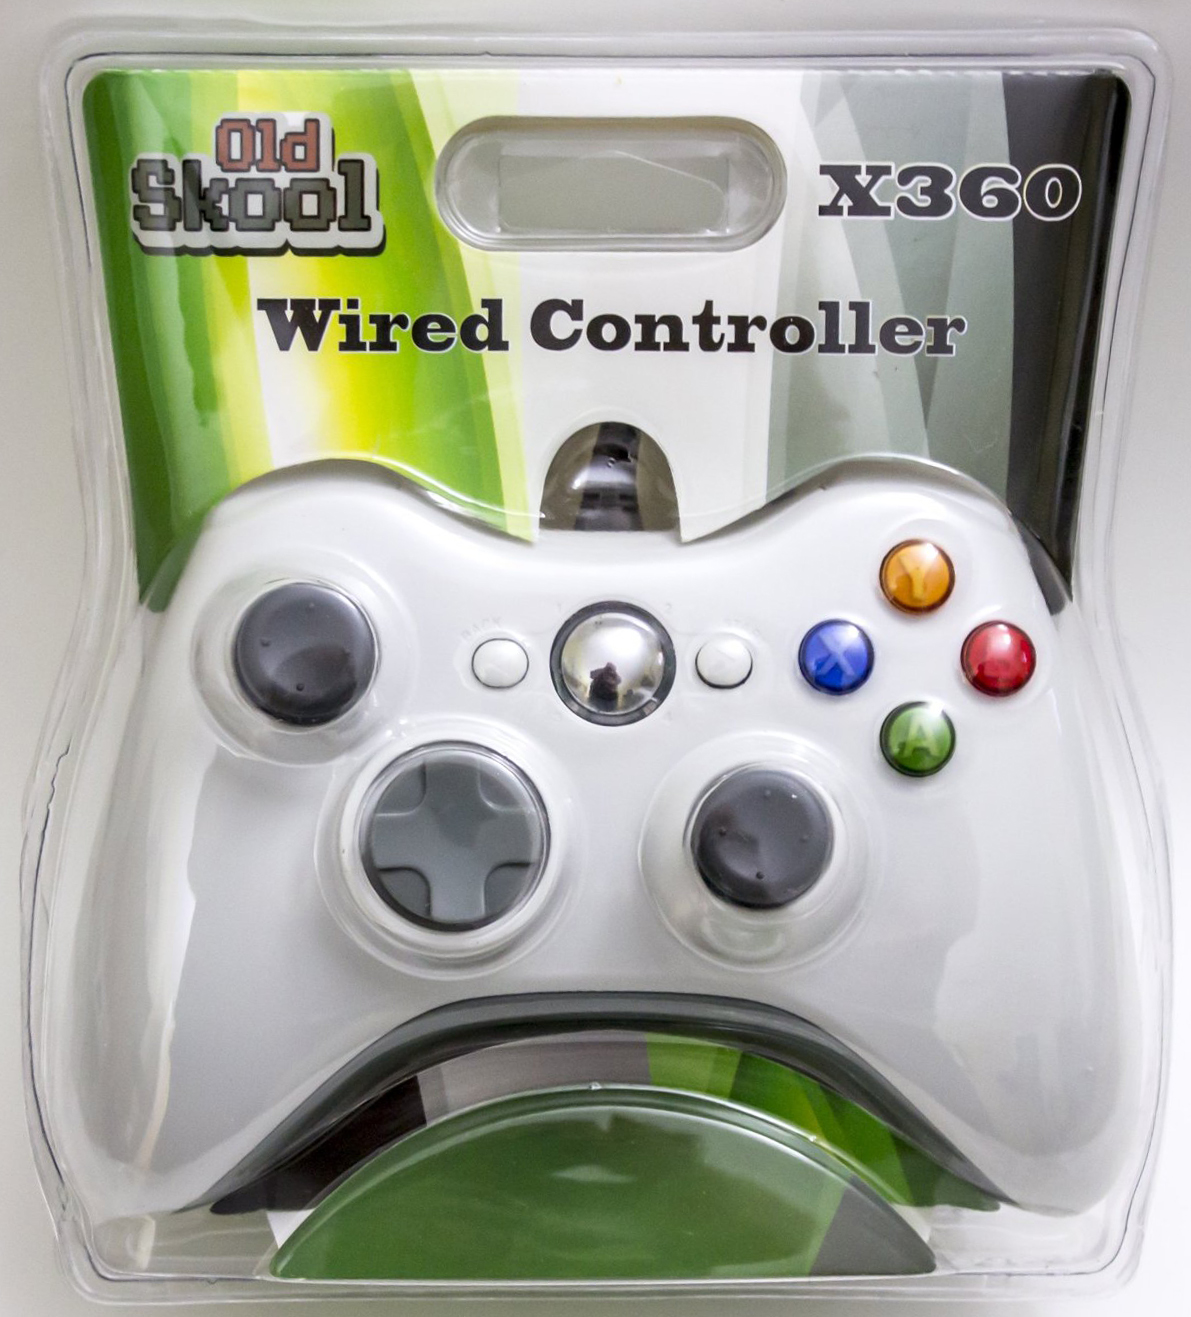 Wired Usb Controller For Pc Xbox 360 White Walmart Com Walmart Com